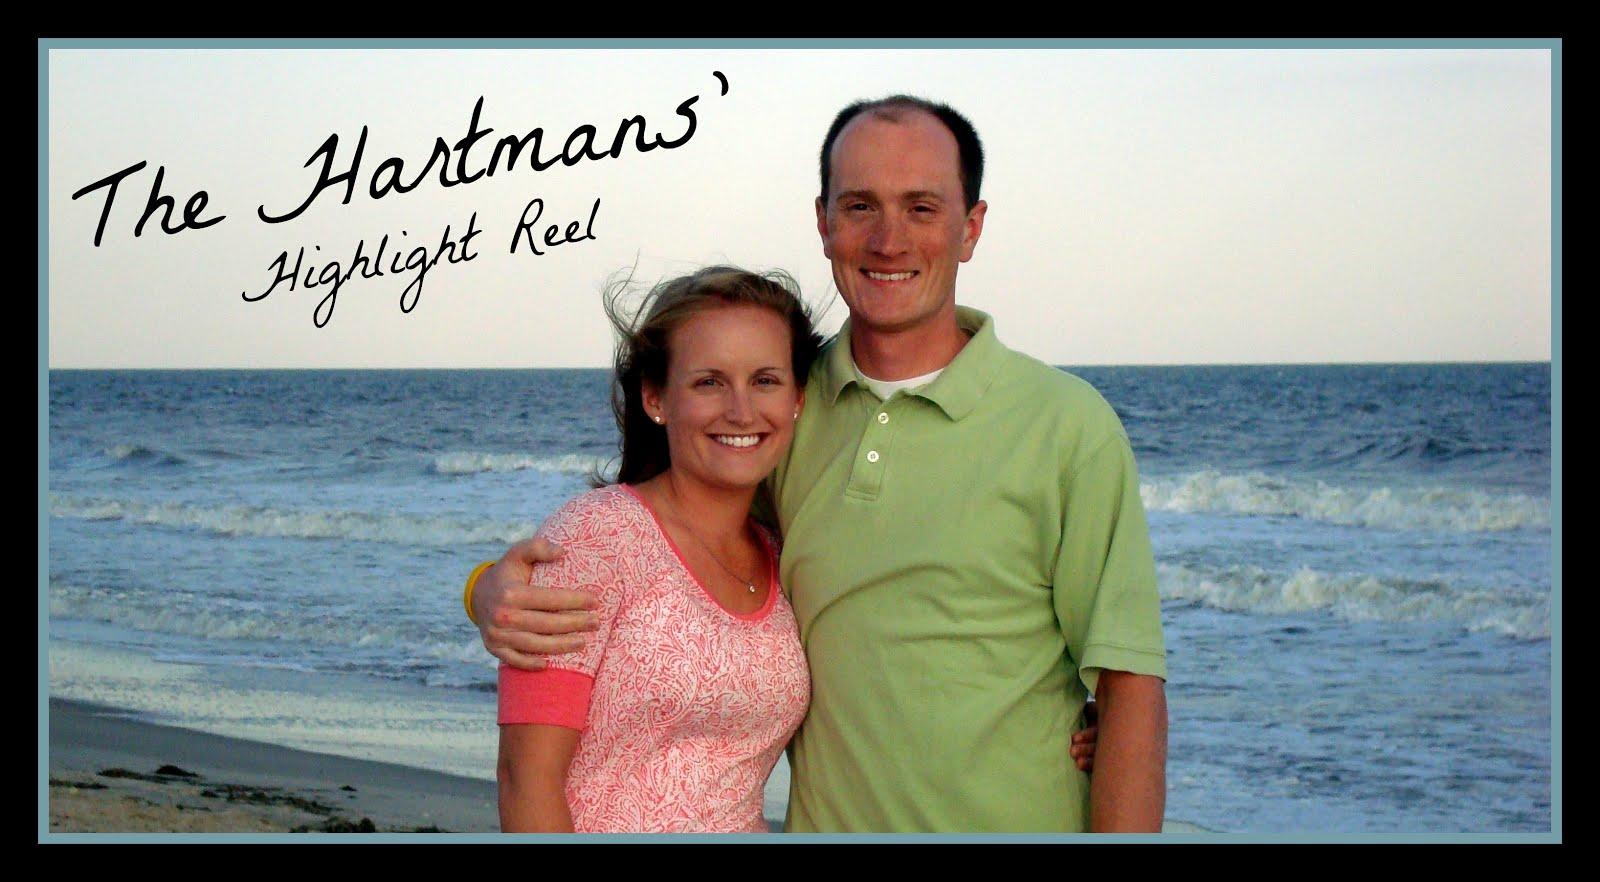 The Hartmans' Highlight Reel